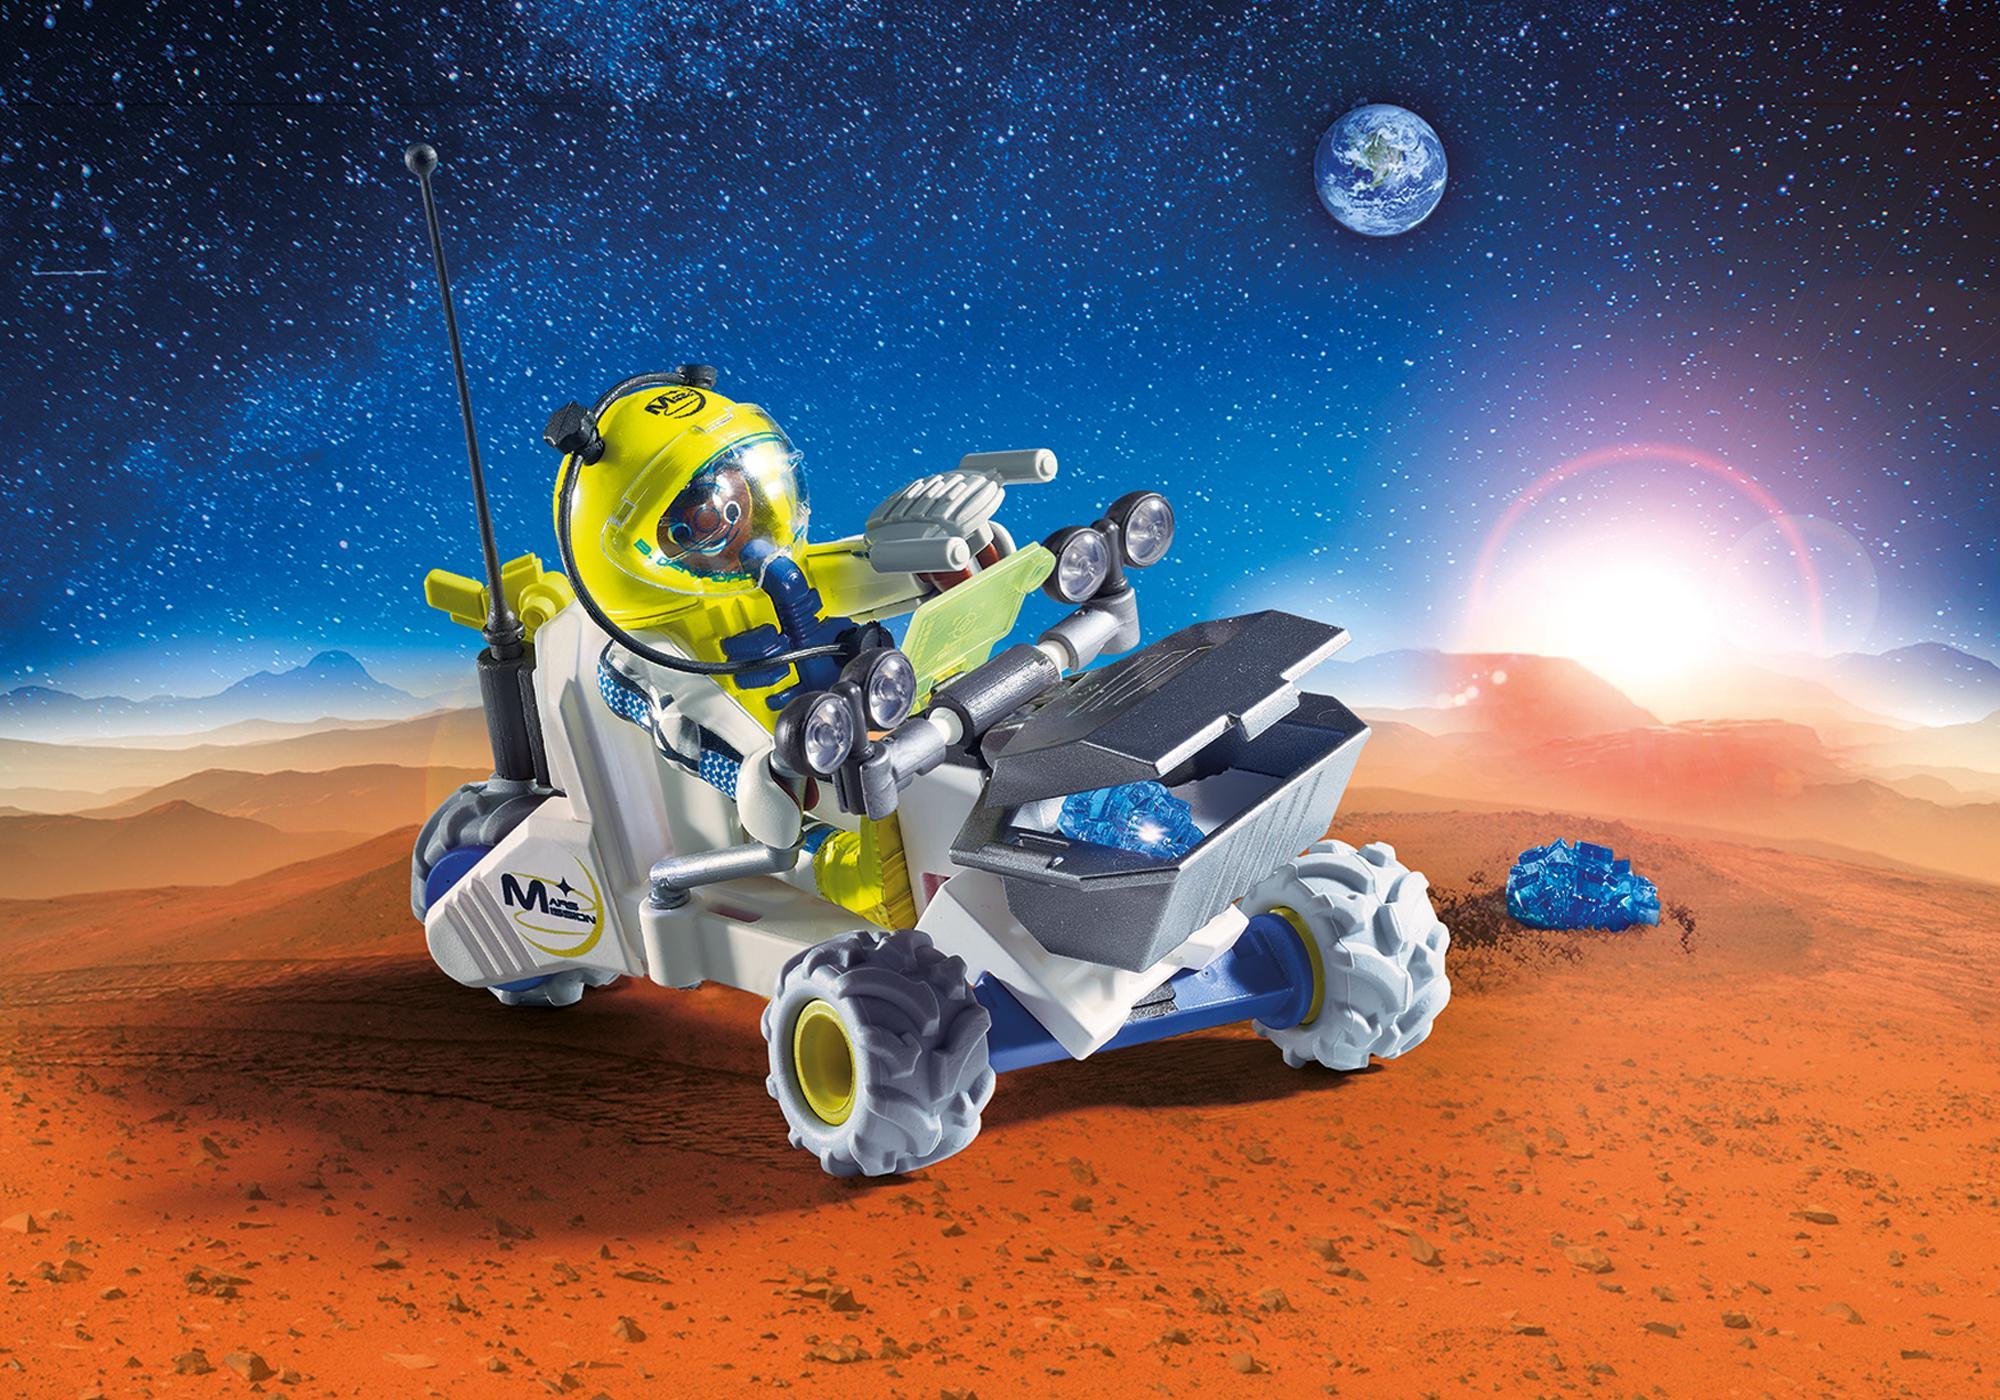 http://media.playmobil.com/i/playmobil/9491_product_detail/Mars trike